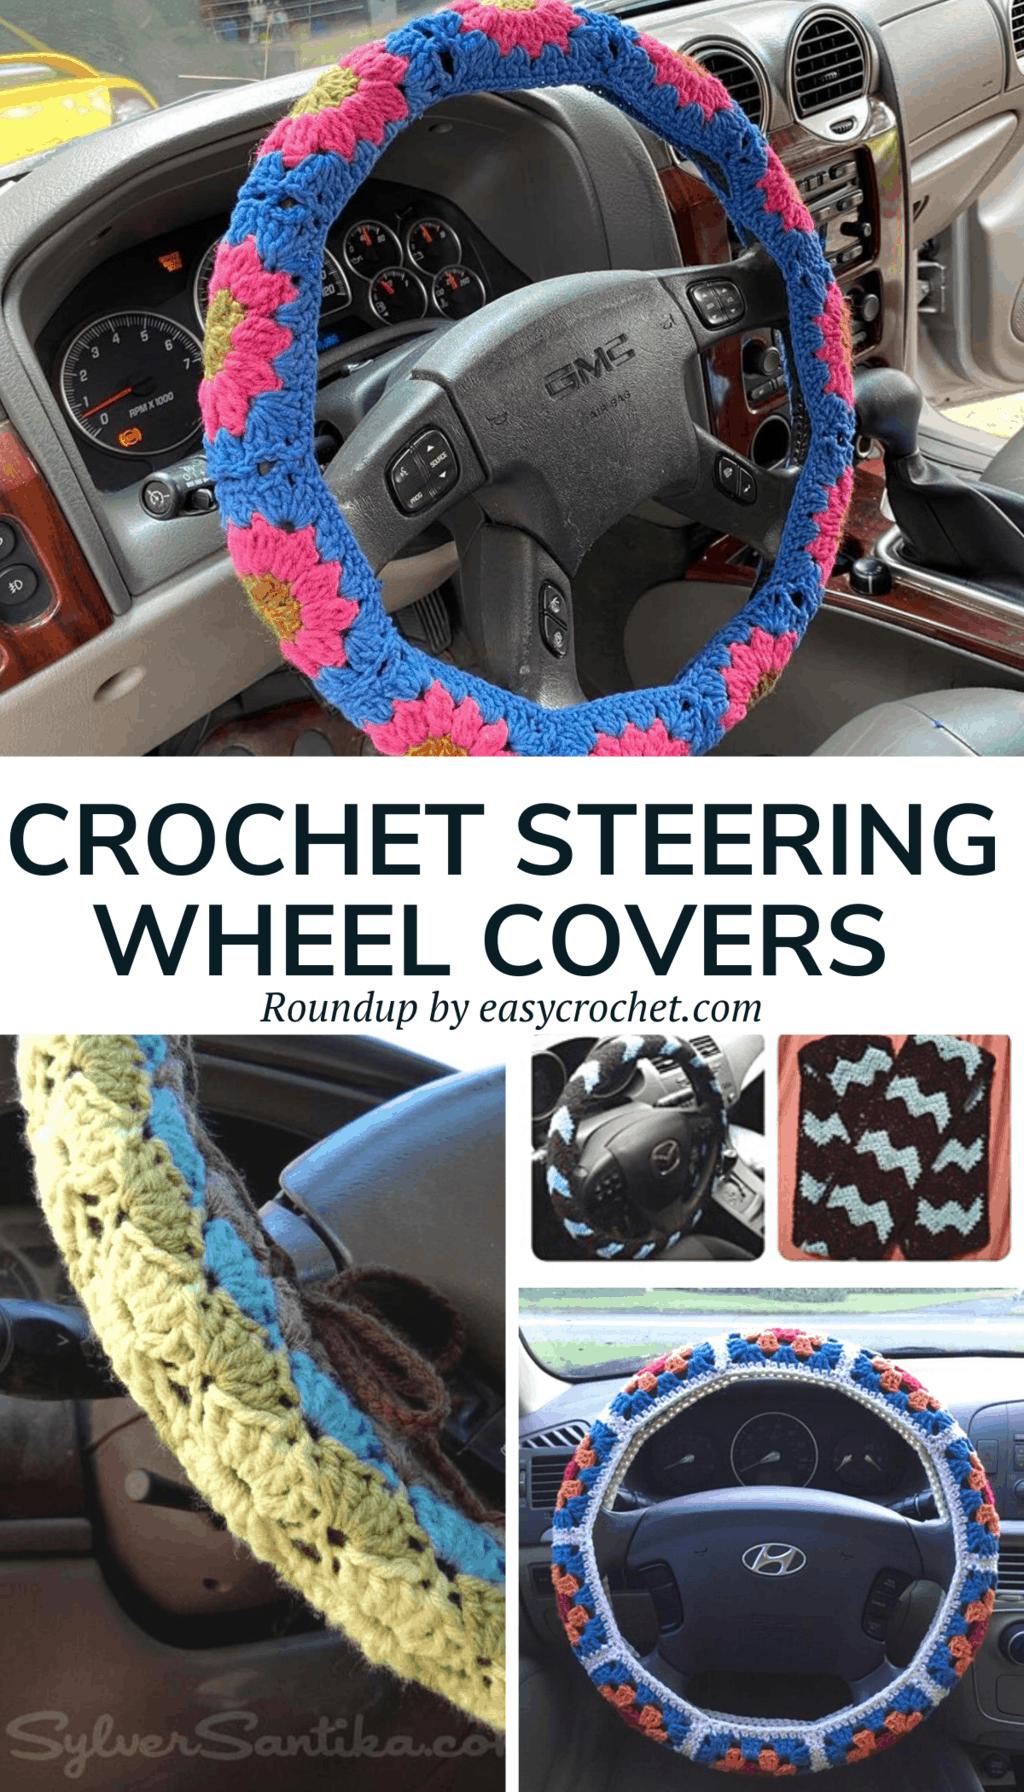 Crochet Steering Wheel Cover Patterns